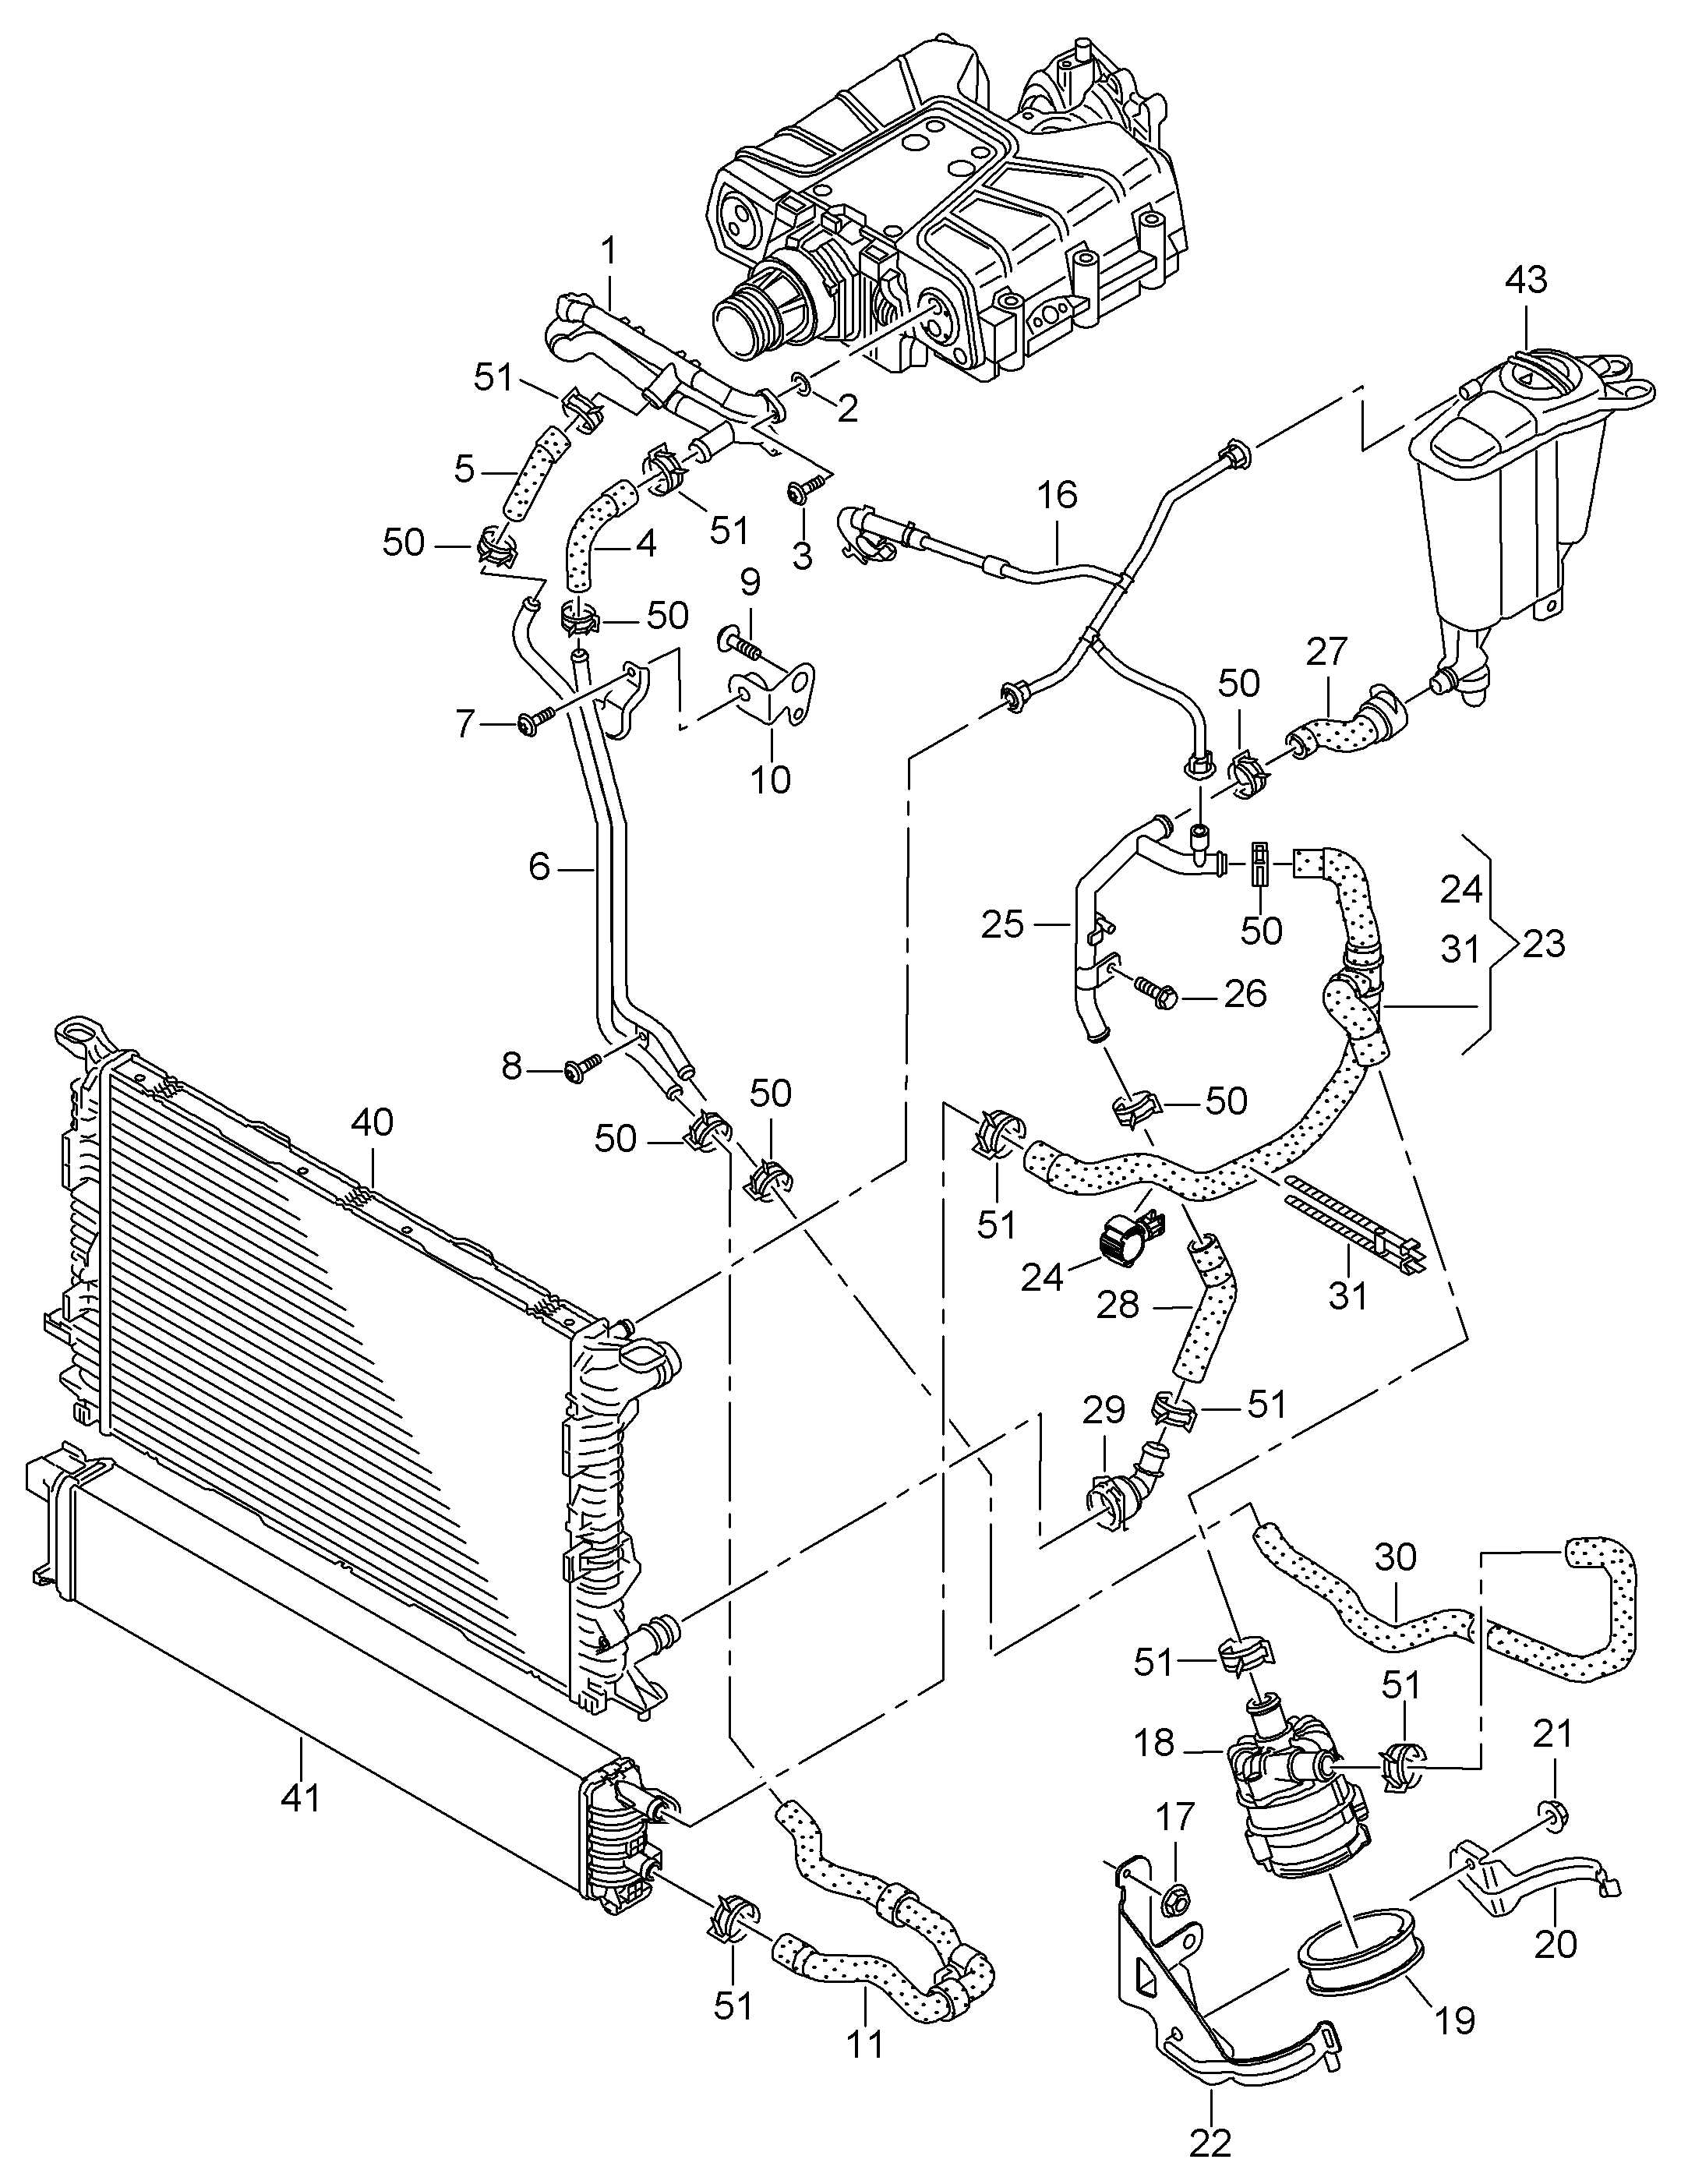 Audi S5 Engine Diagram - Wiring Diagram Direct stale-tiger -  stale-tiger.siciliabeb.it   2015 Audi S5 Engine Diagram      stale-tiger.siciliabeb.it